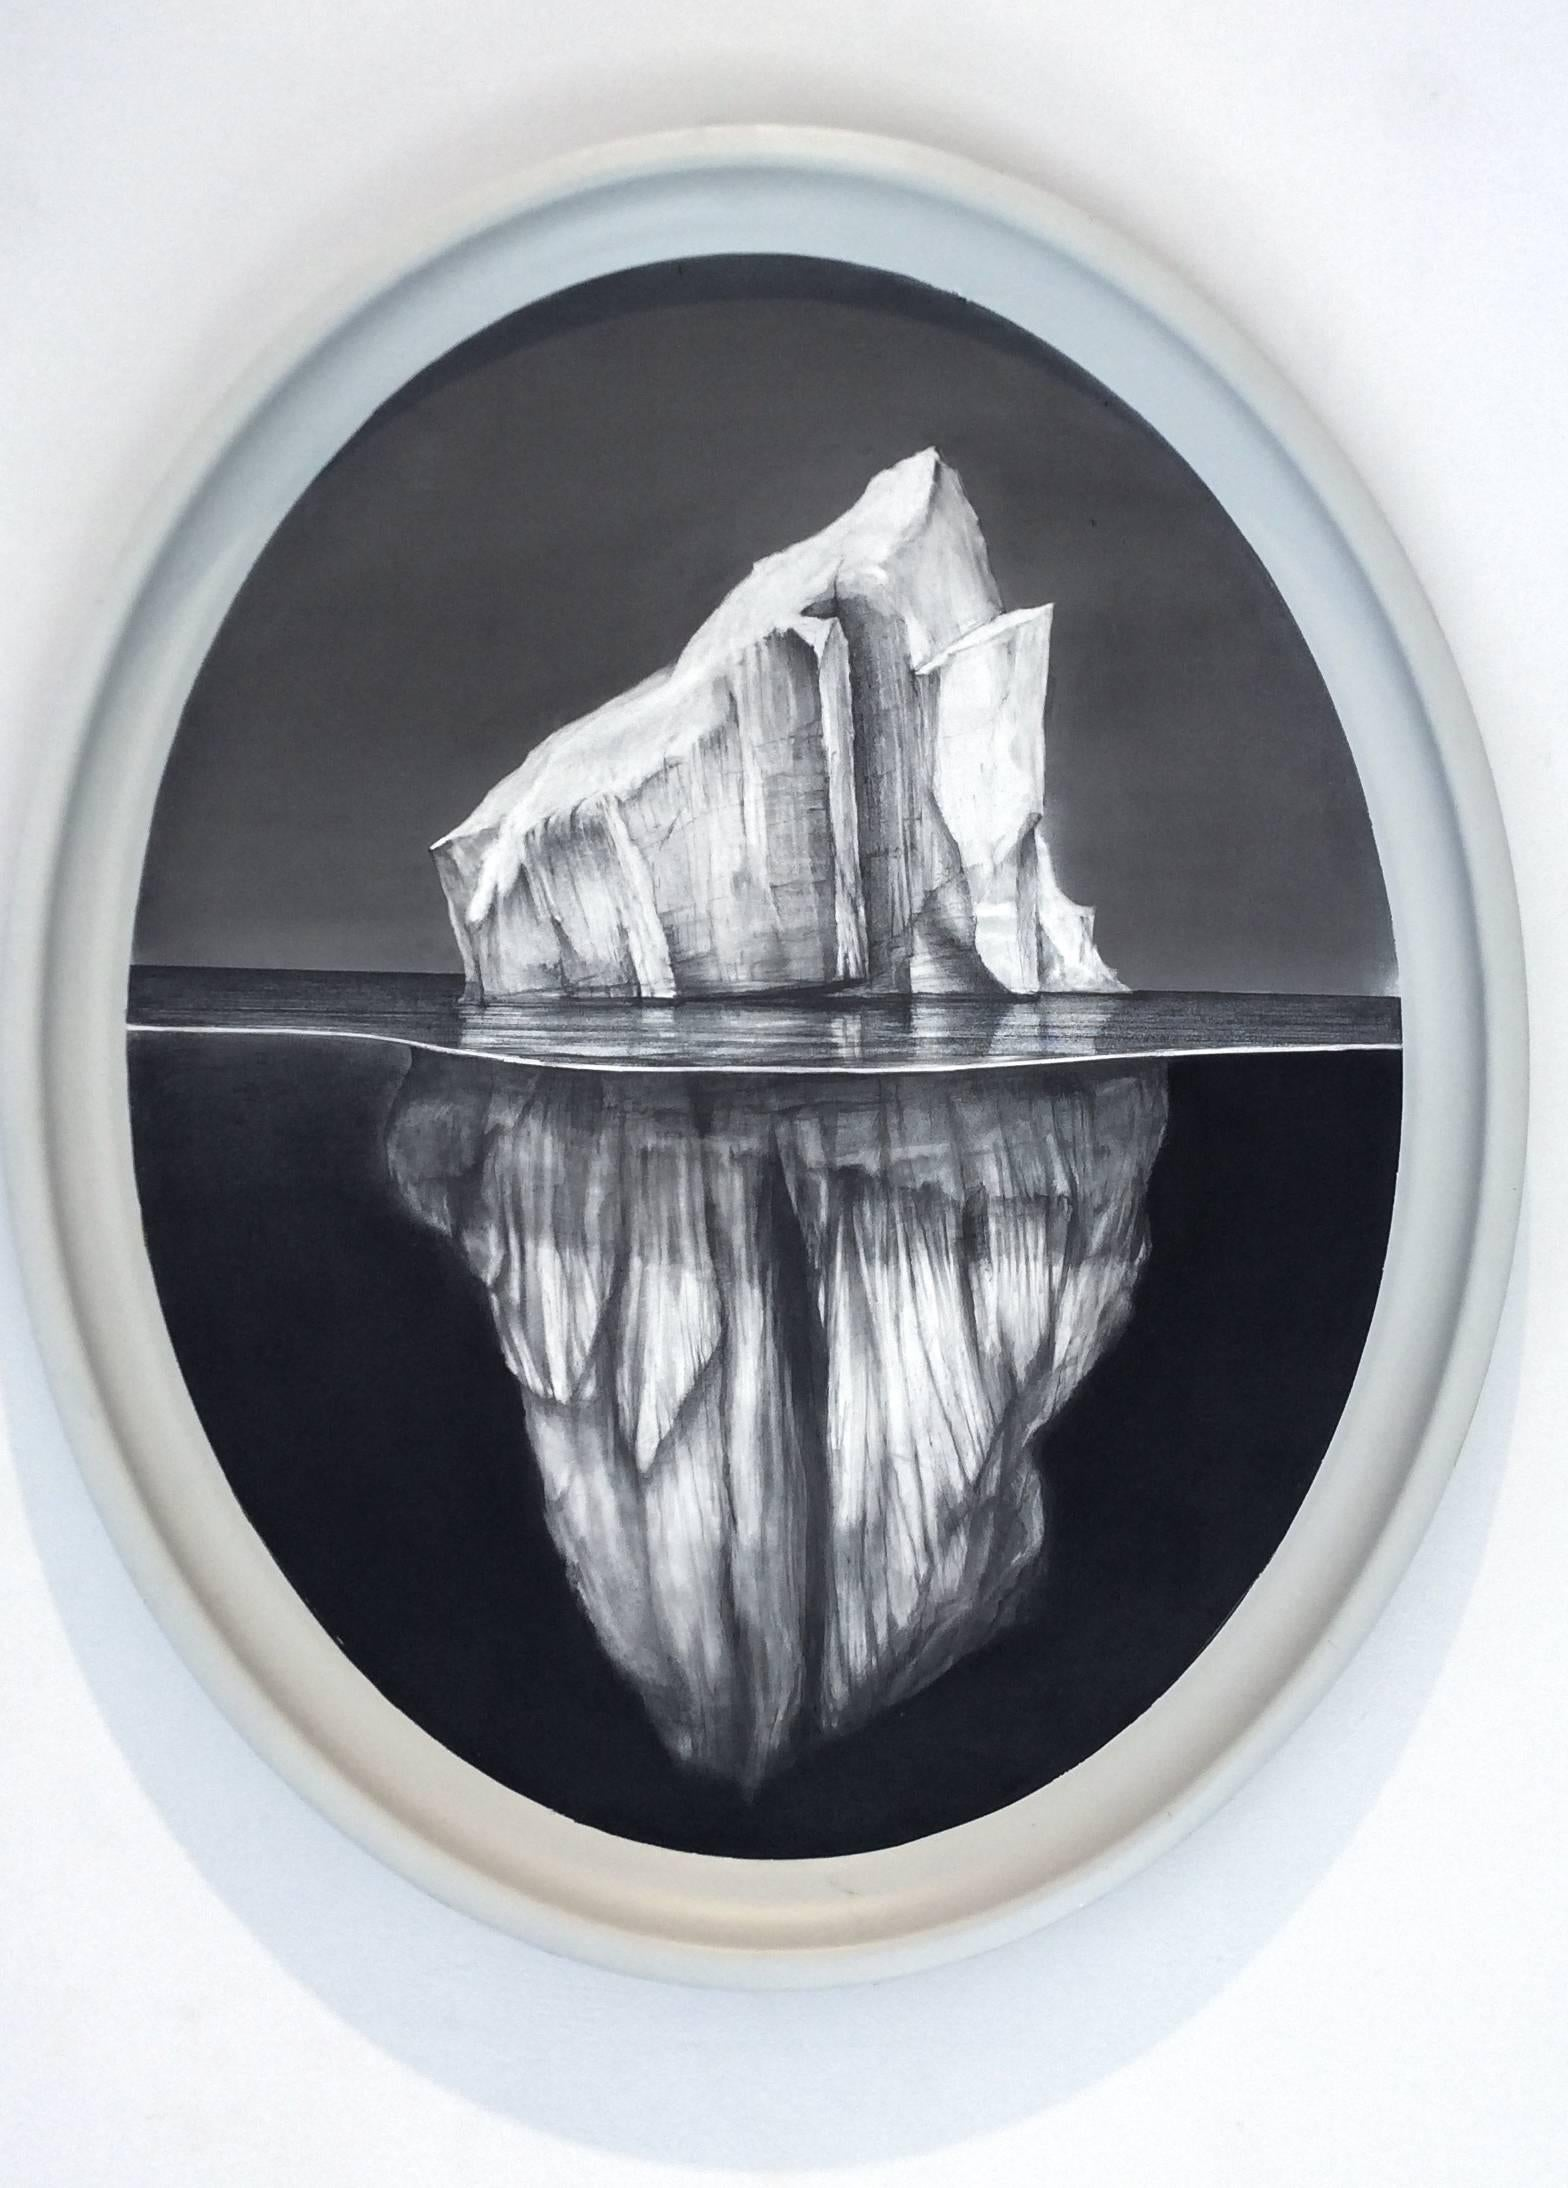 Iceberg #5 (Victorian -esque oval graphite Drawing of Iceberg on Aluminum)